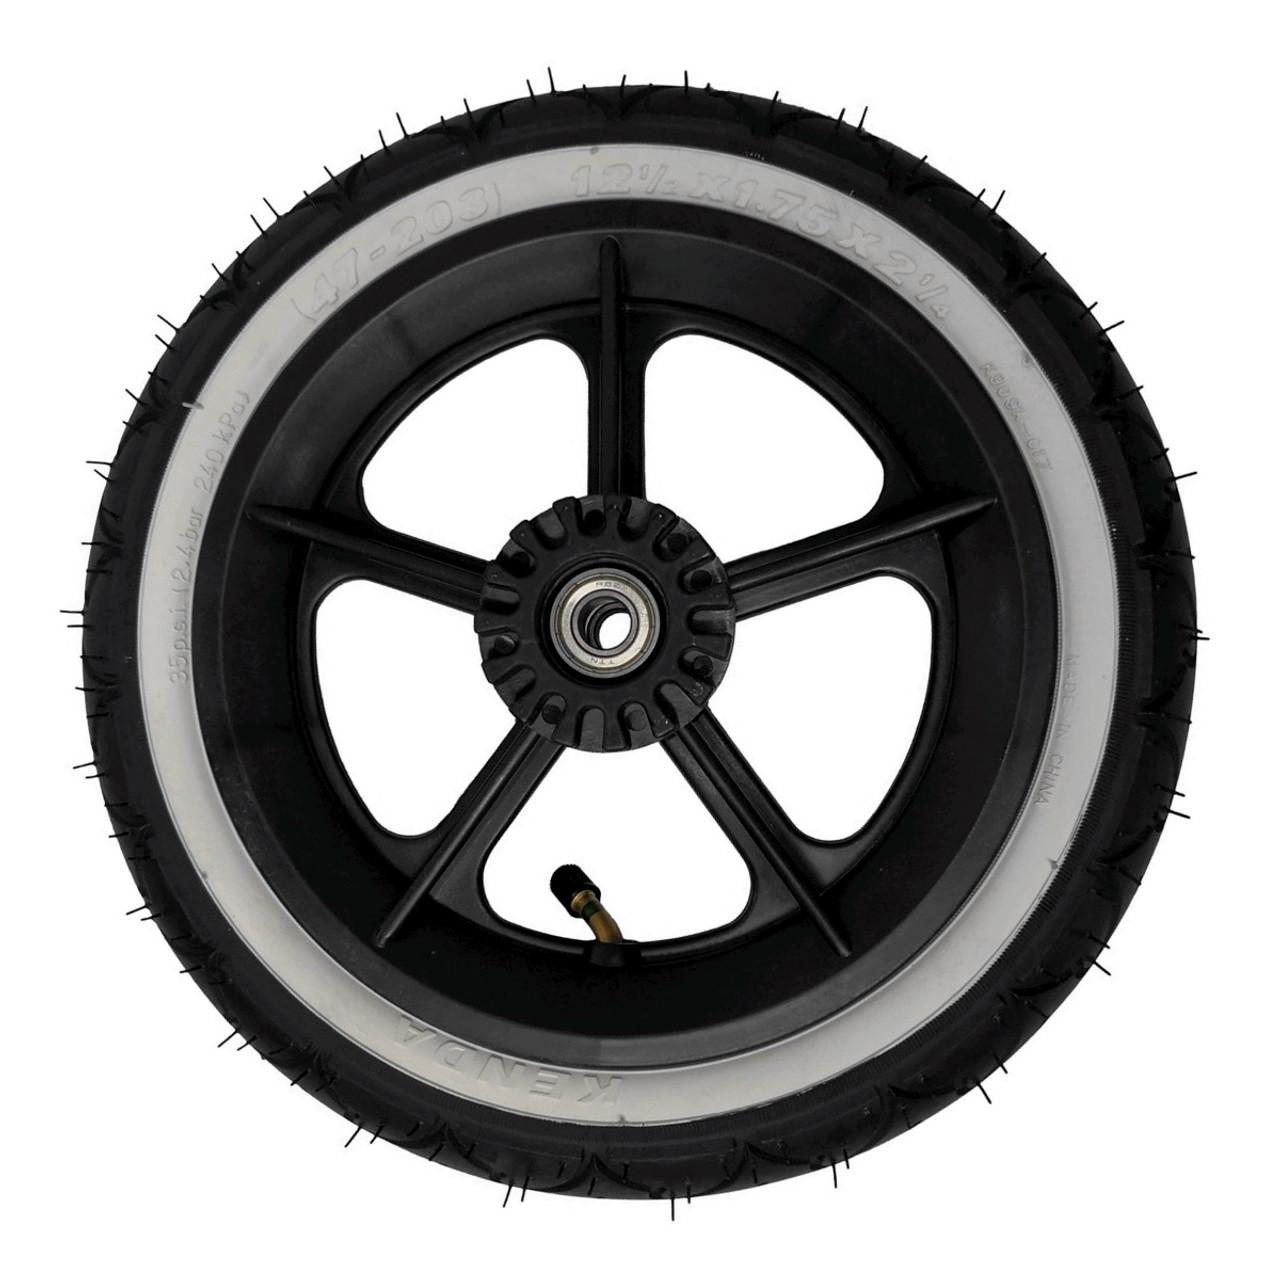 Phil&Teds Wheel- Complete Rear Wheel fits Navigator, Sport,Classic, Hammerhead and Explorer